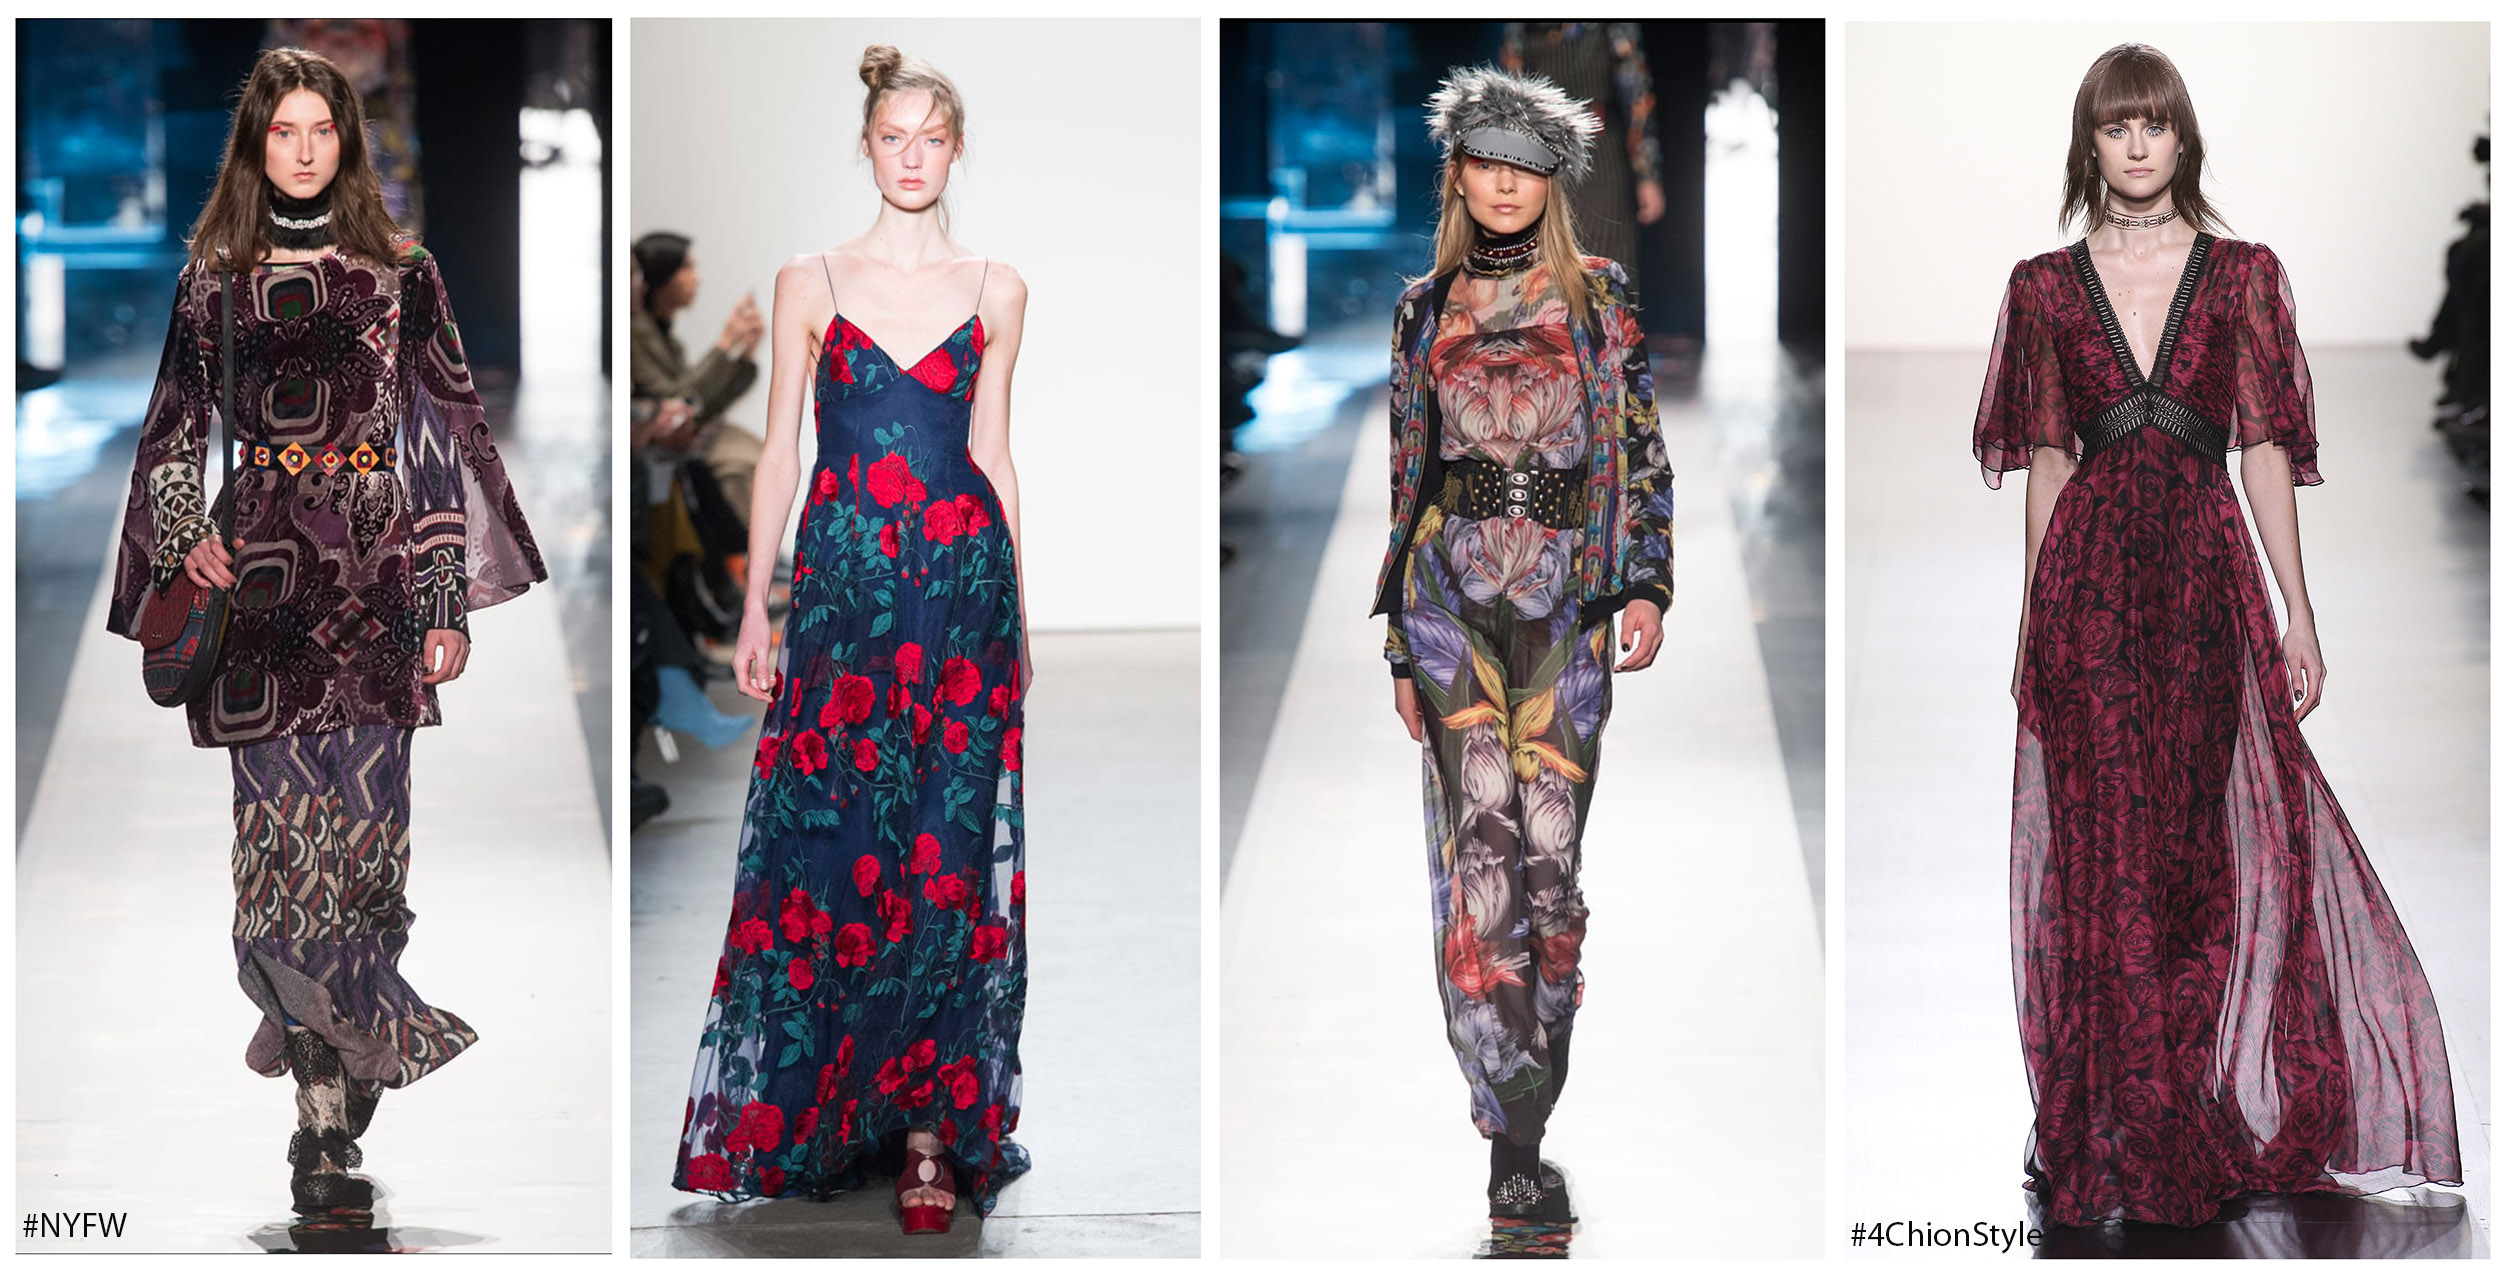 nyfw-new-york-fashion-day-1-4chion-lifestyle-print